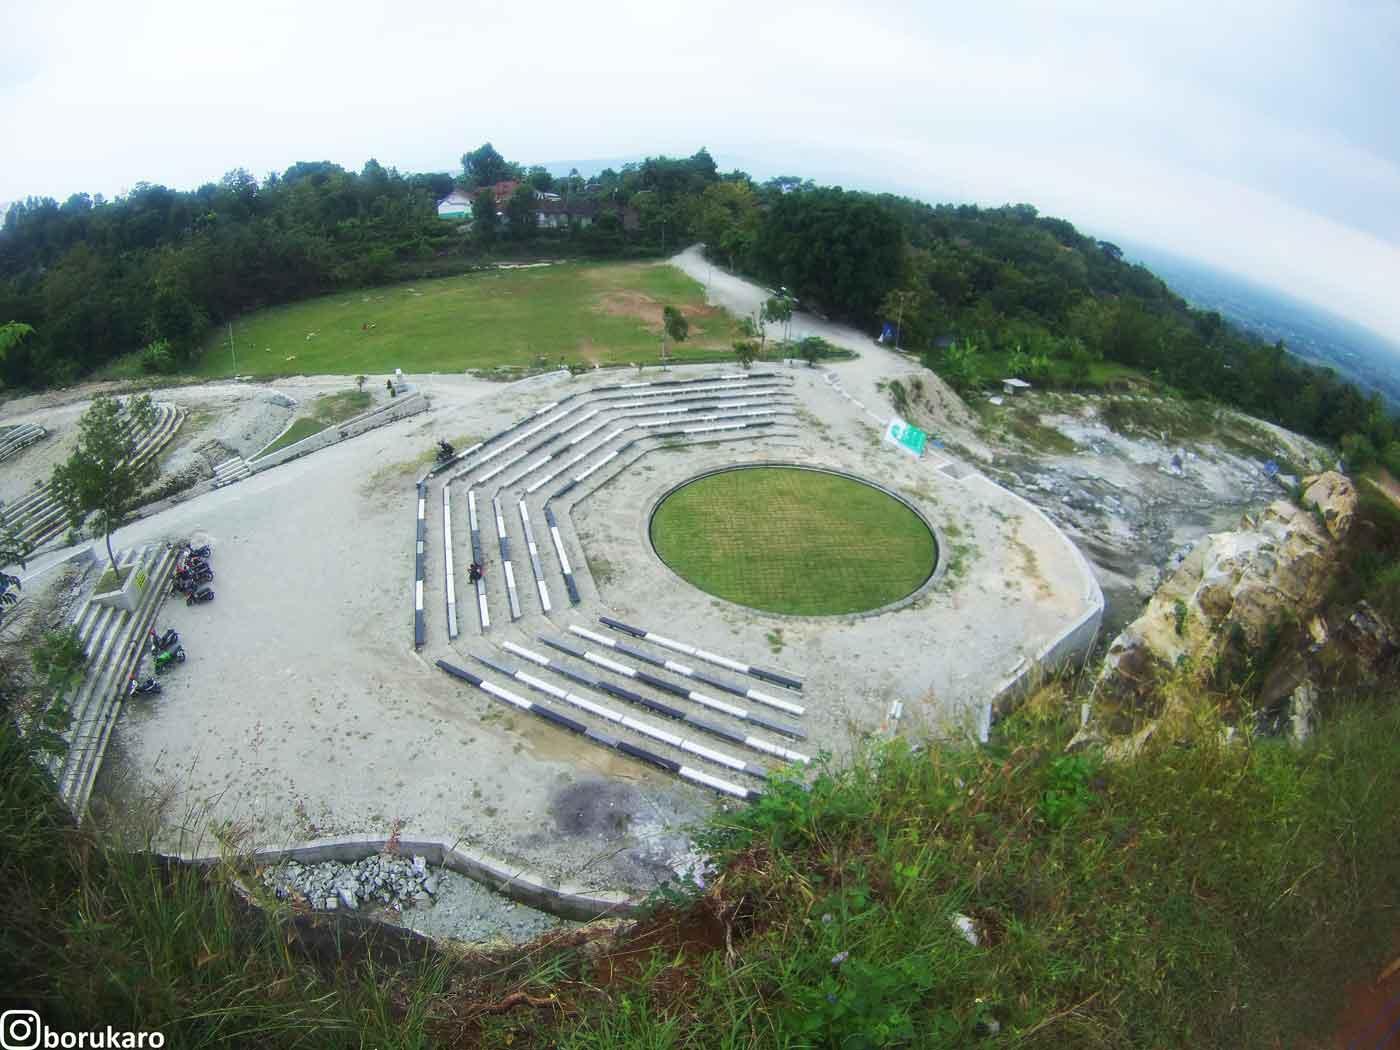 Tempat duduk yang disediakan di Tebing Breksi jika di lihat dari bukit